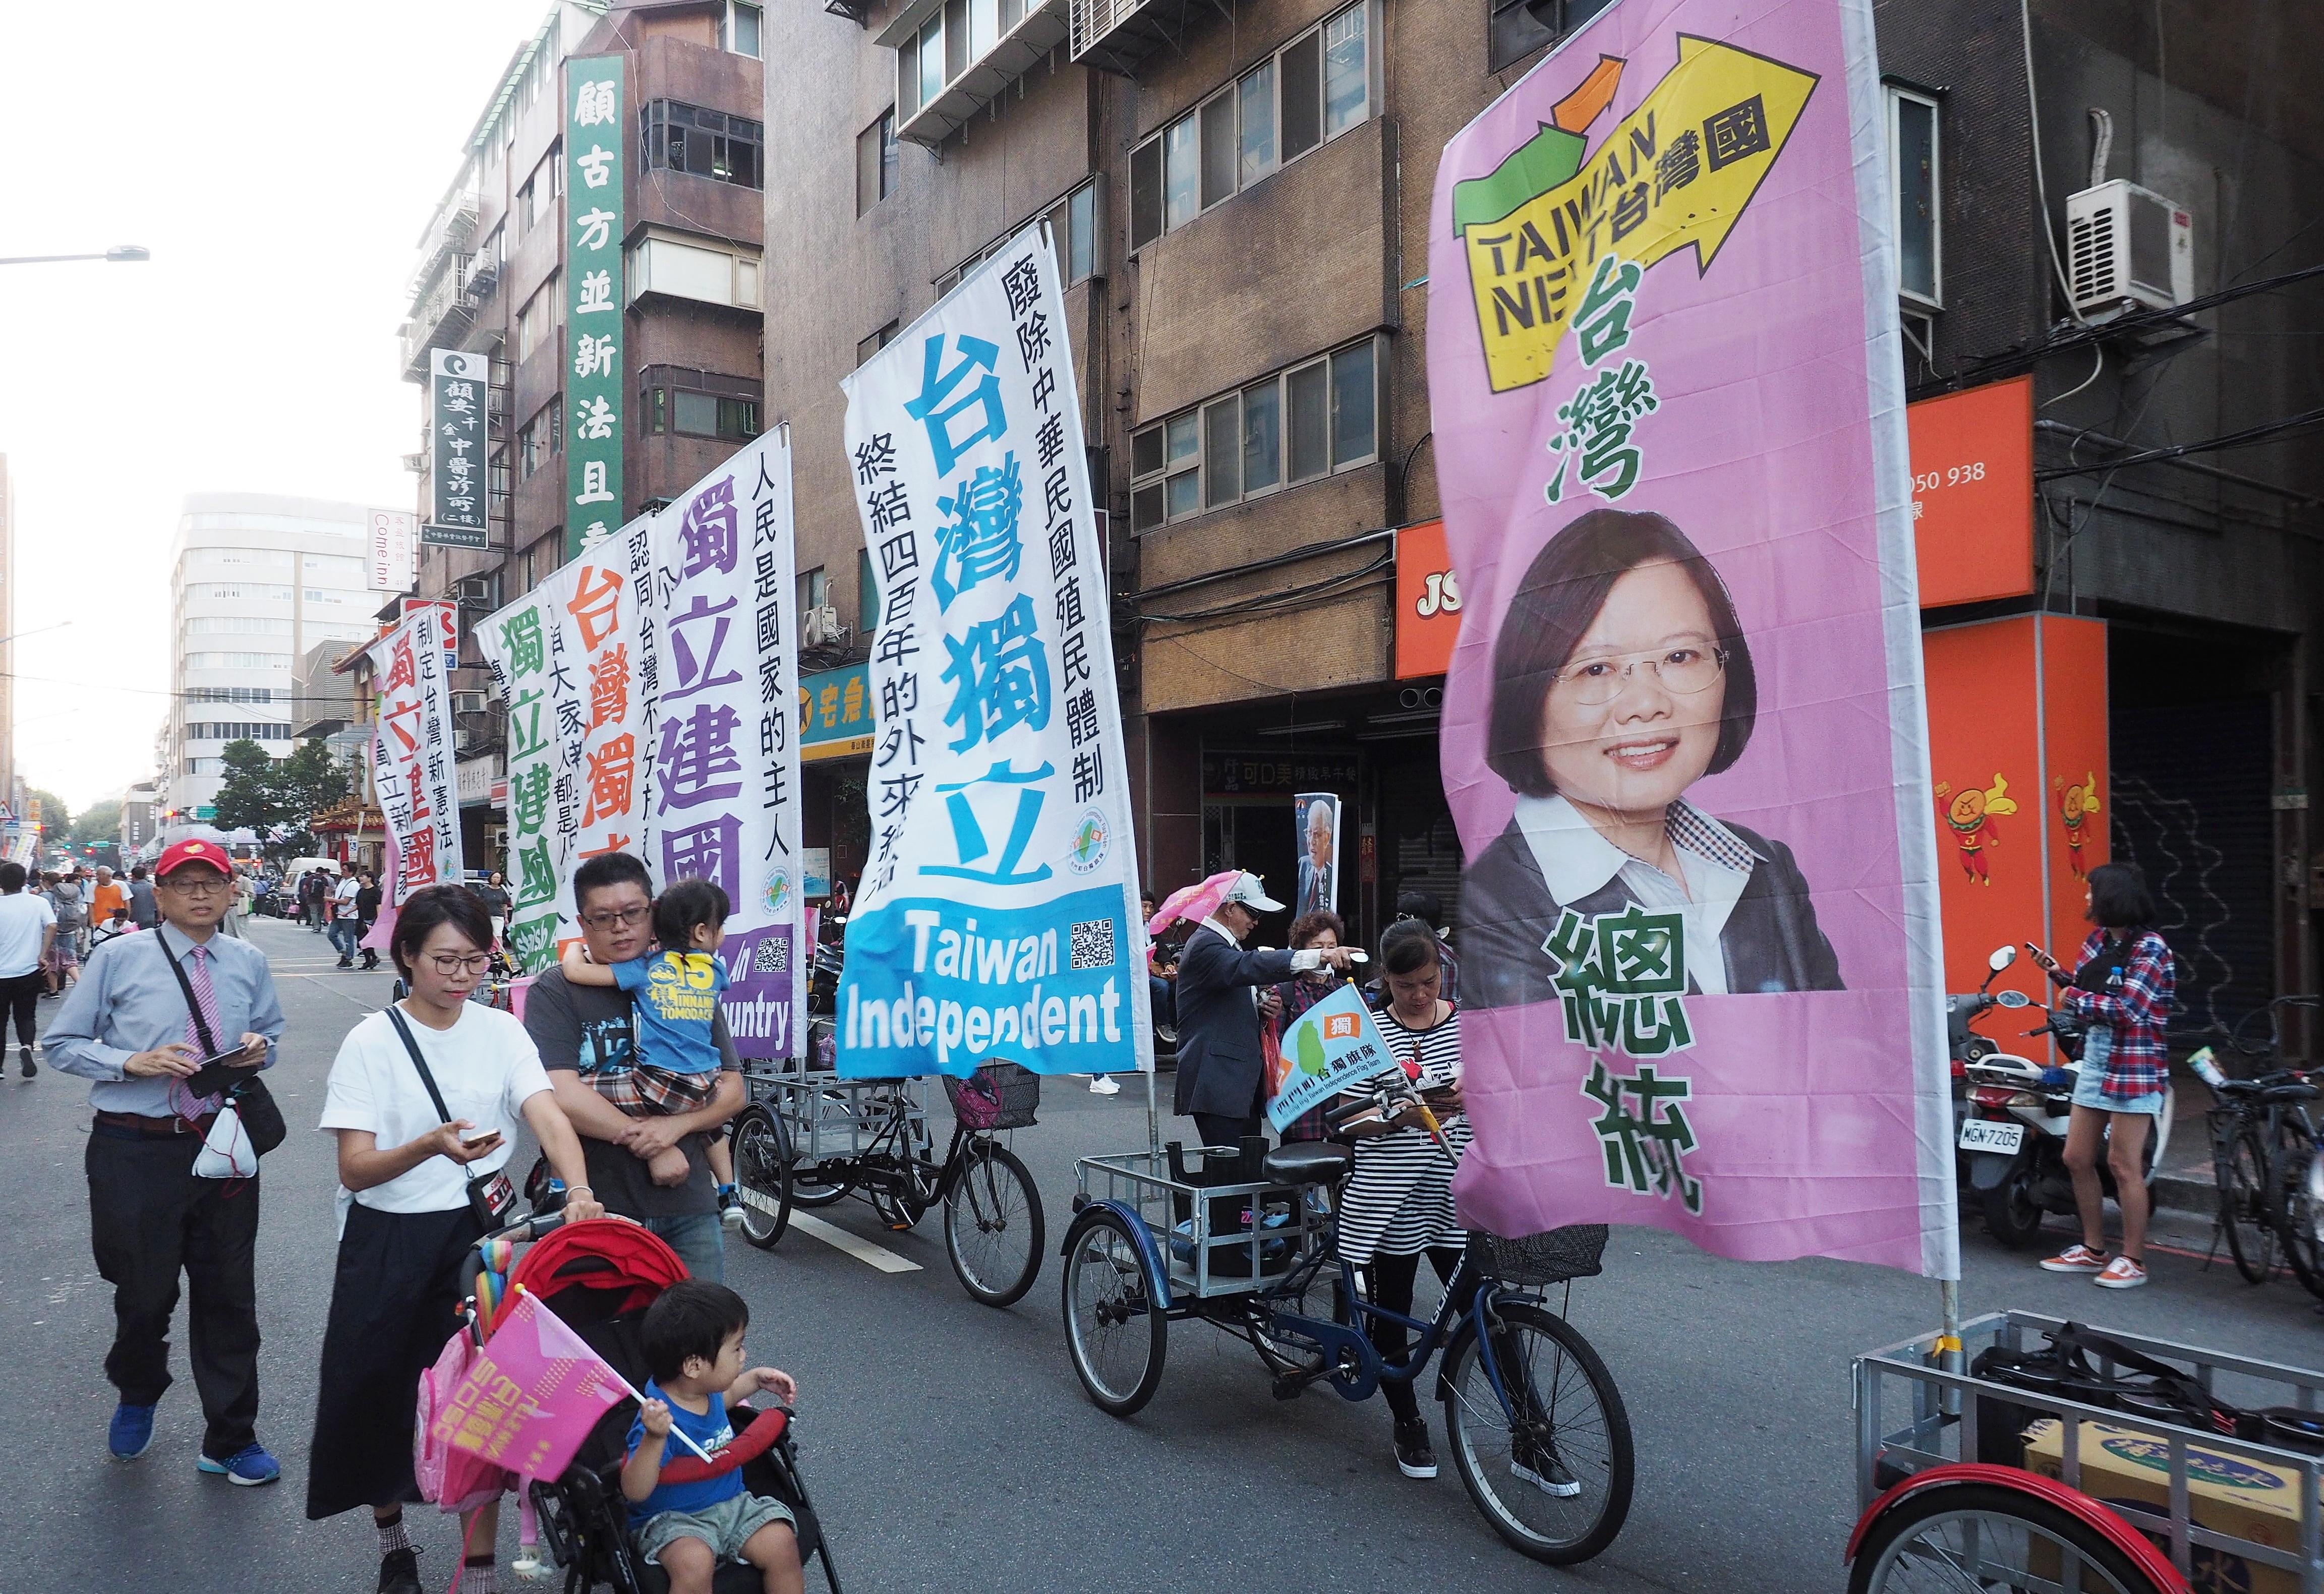 Banners showing Taiwan's President Tsai Ing-wen are on display near Tsai's campaign rally in Taipei, Taiwan, 17 November 2019.